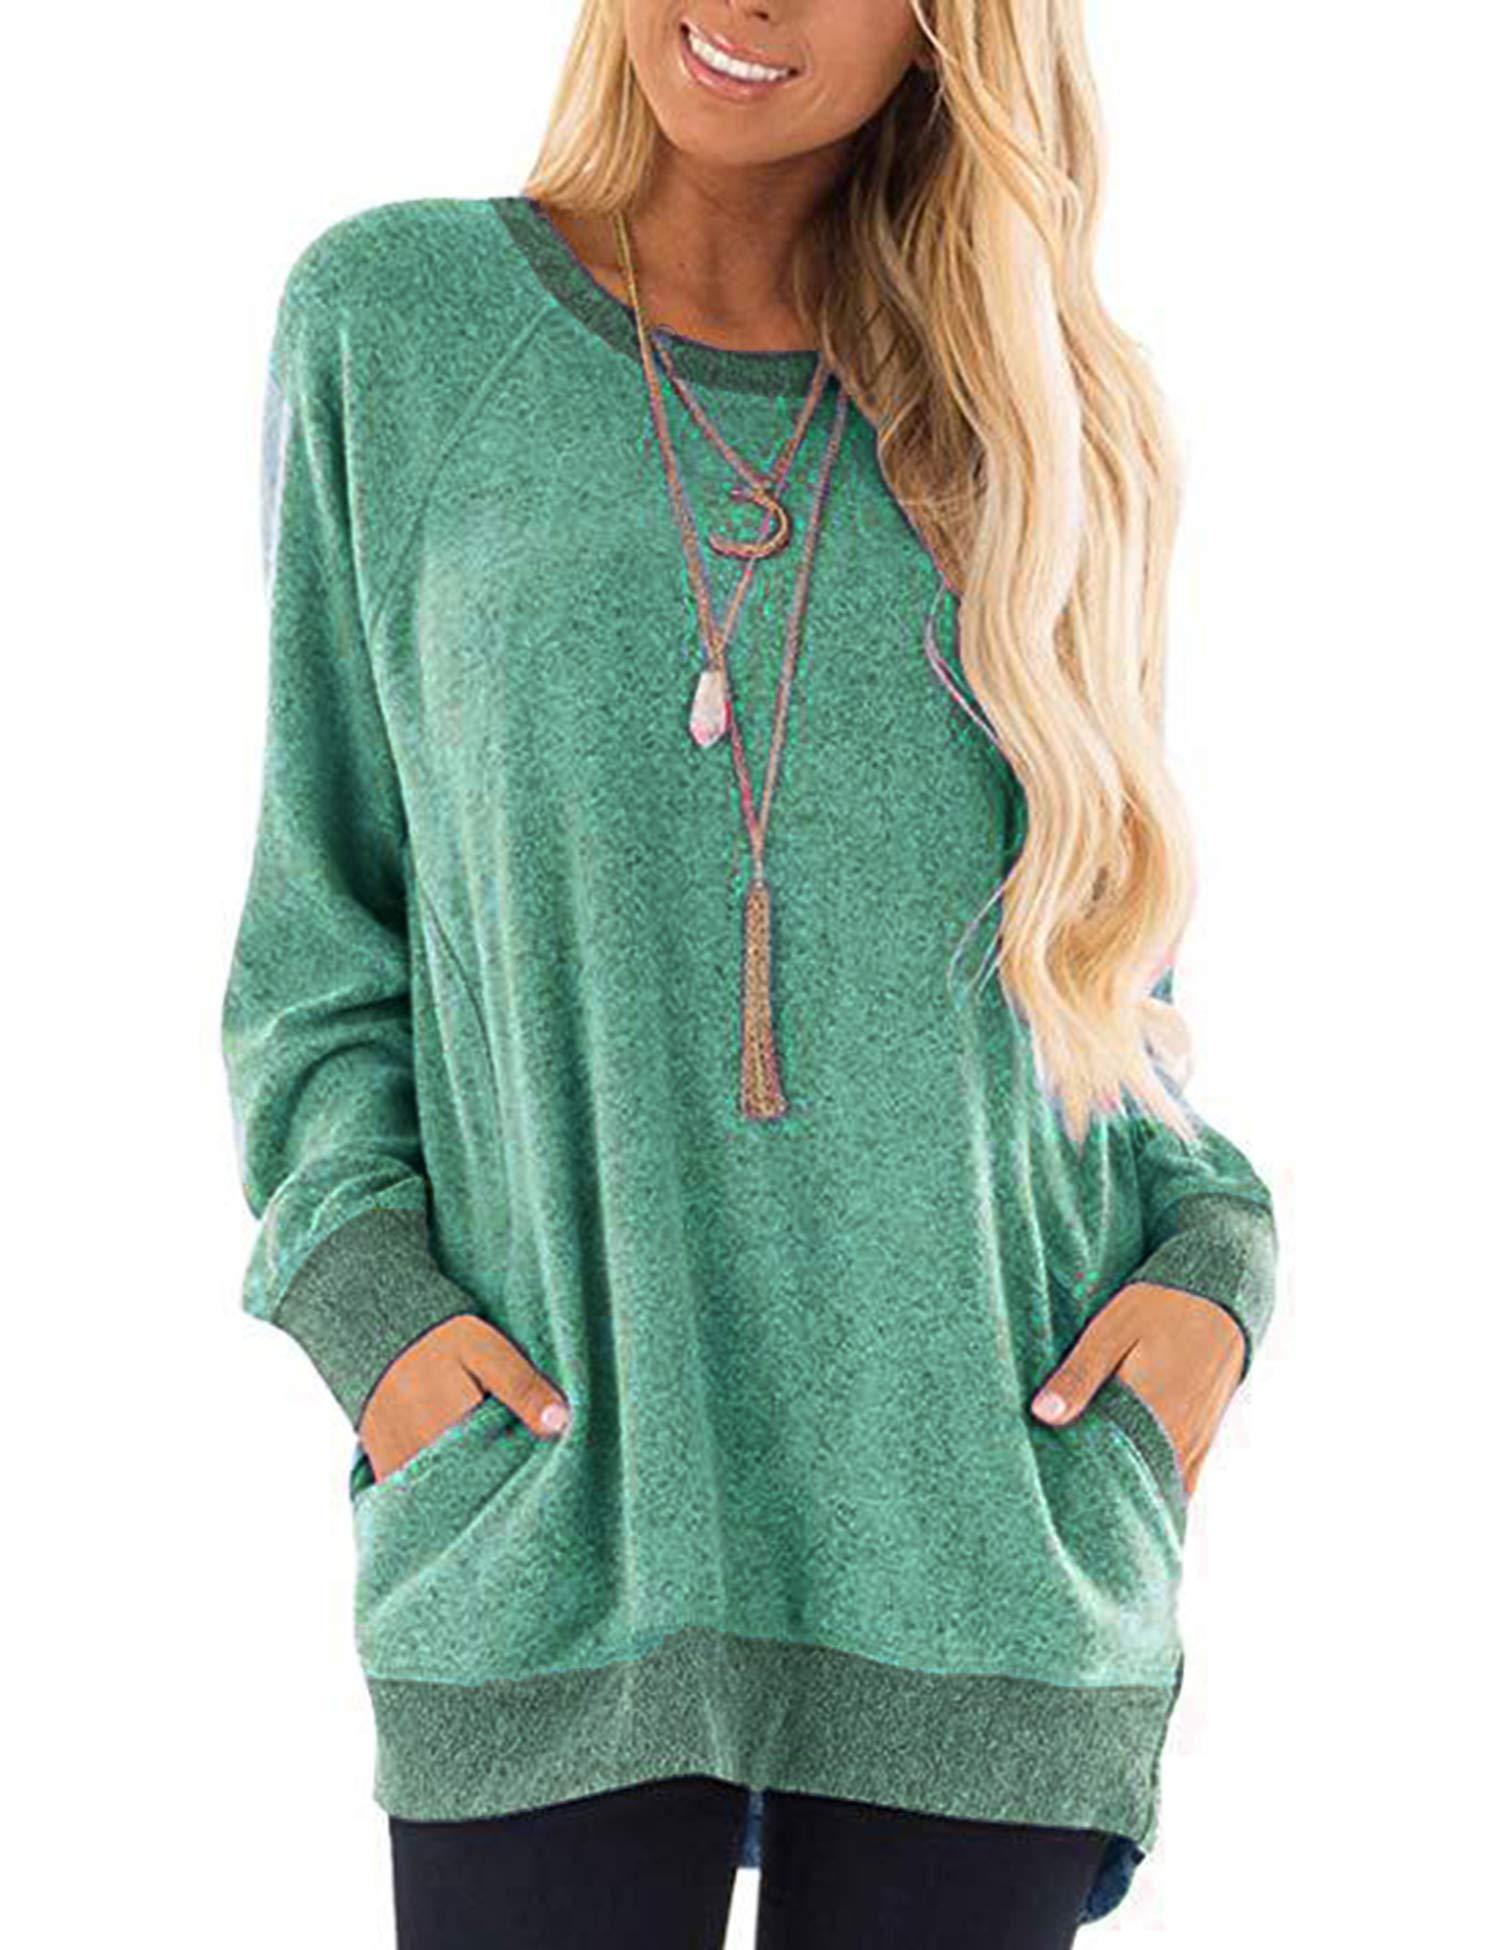 Beyove Womens Casual Color Block Long Sleeve Pocket Sweatshirts T Shirts Round Neck Blouses Tops